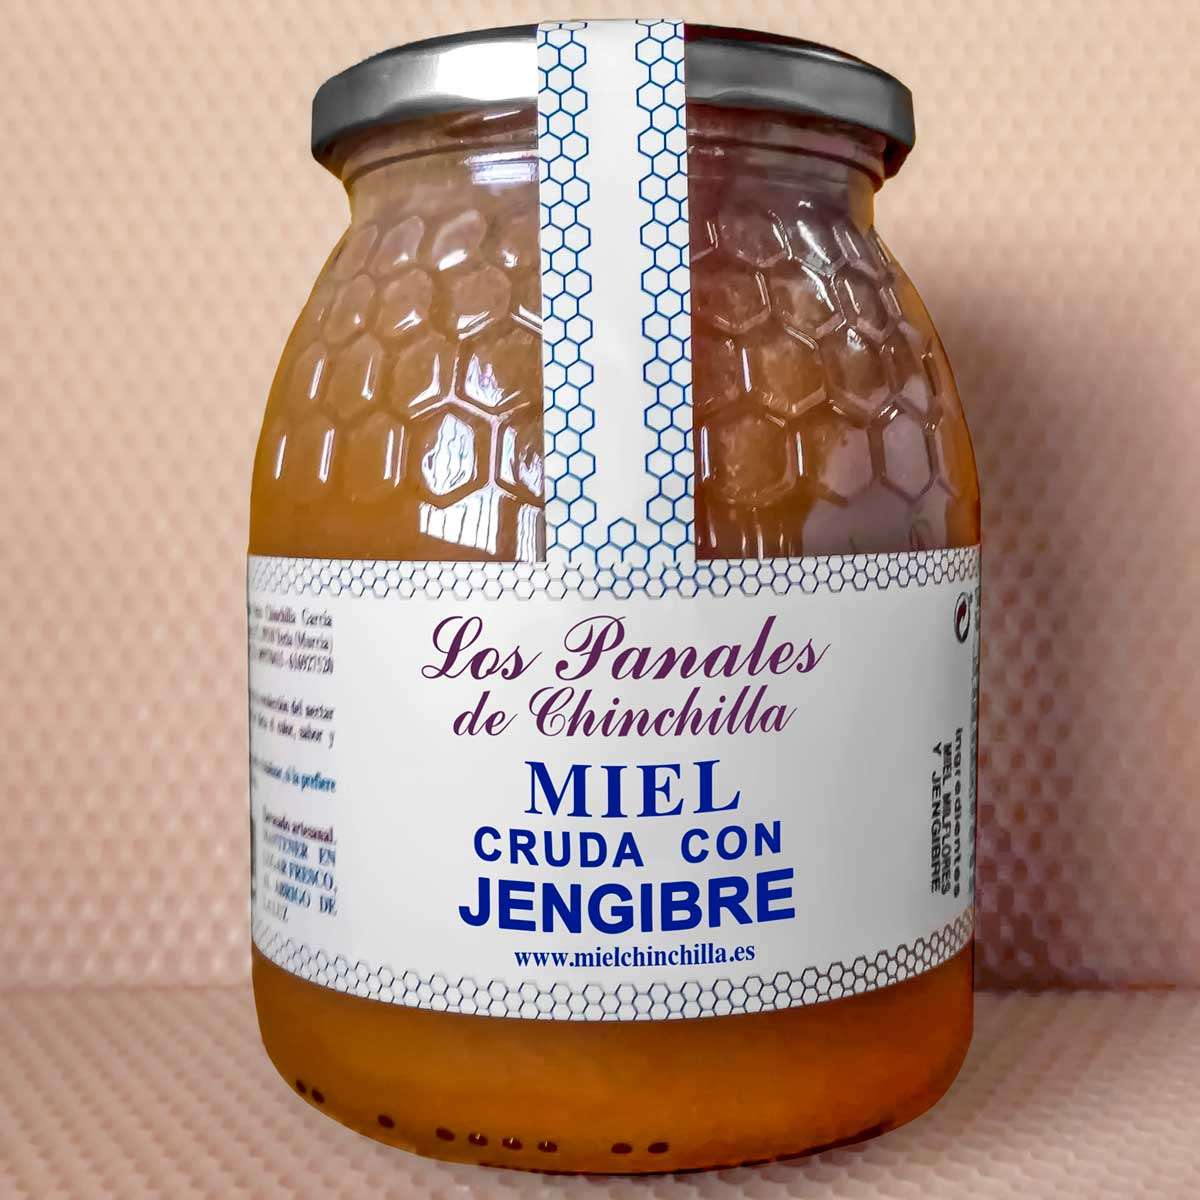 Miel Cruda con Jengibre Panales de Chinchilla 1 Kg-